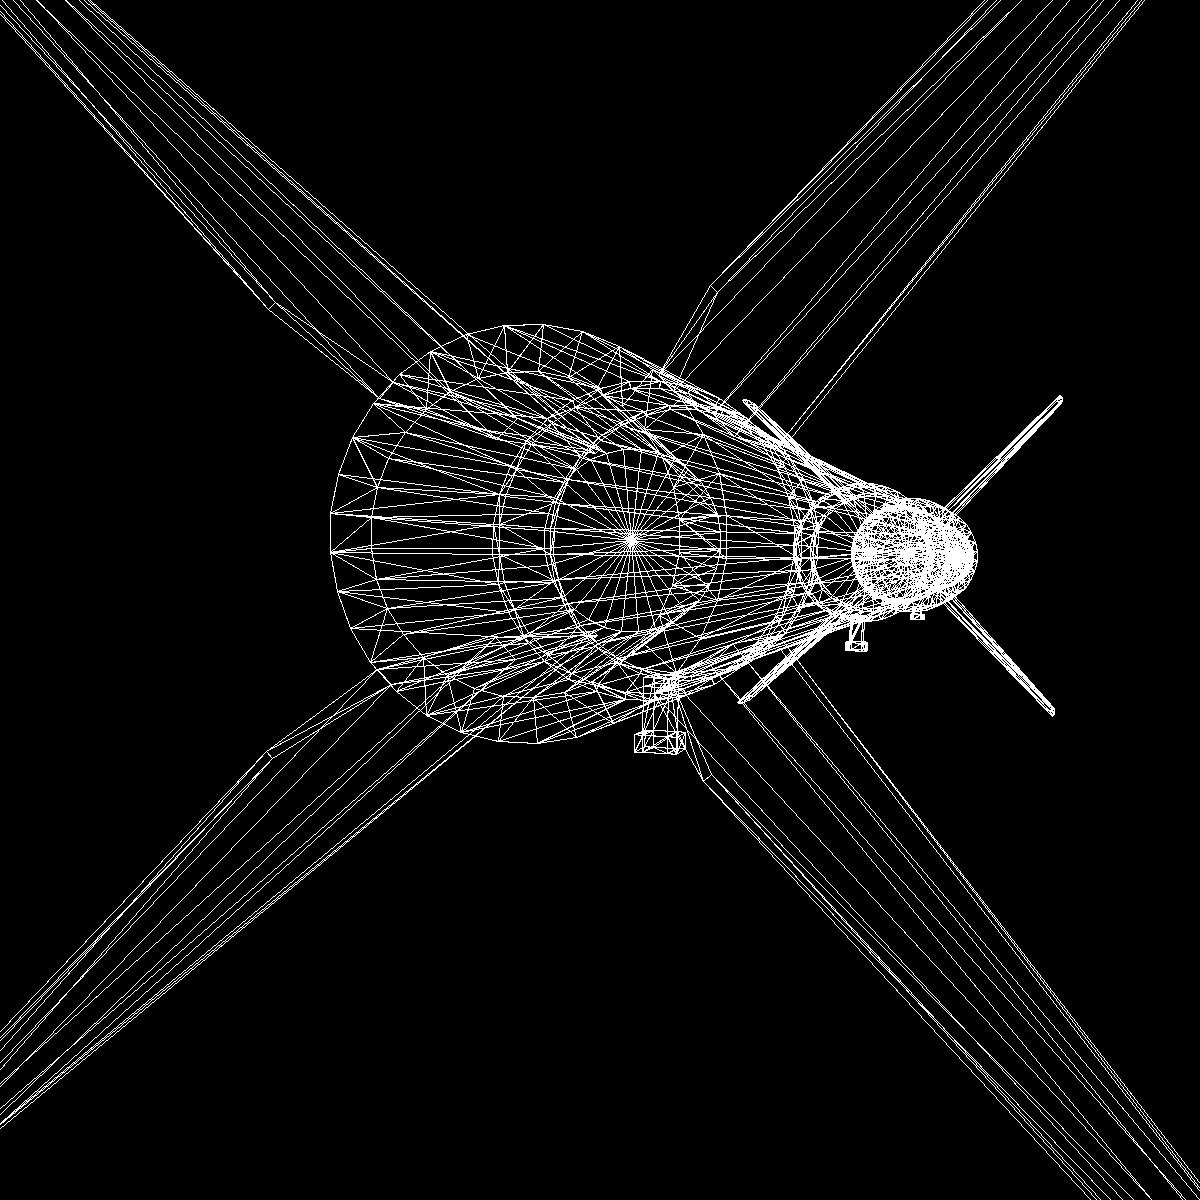 Astrobee 200 Rocket 3d model 3ds dxf fbx blend cob dae X   obj 165967